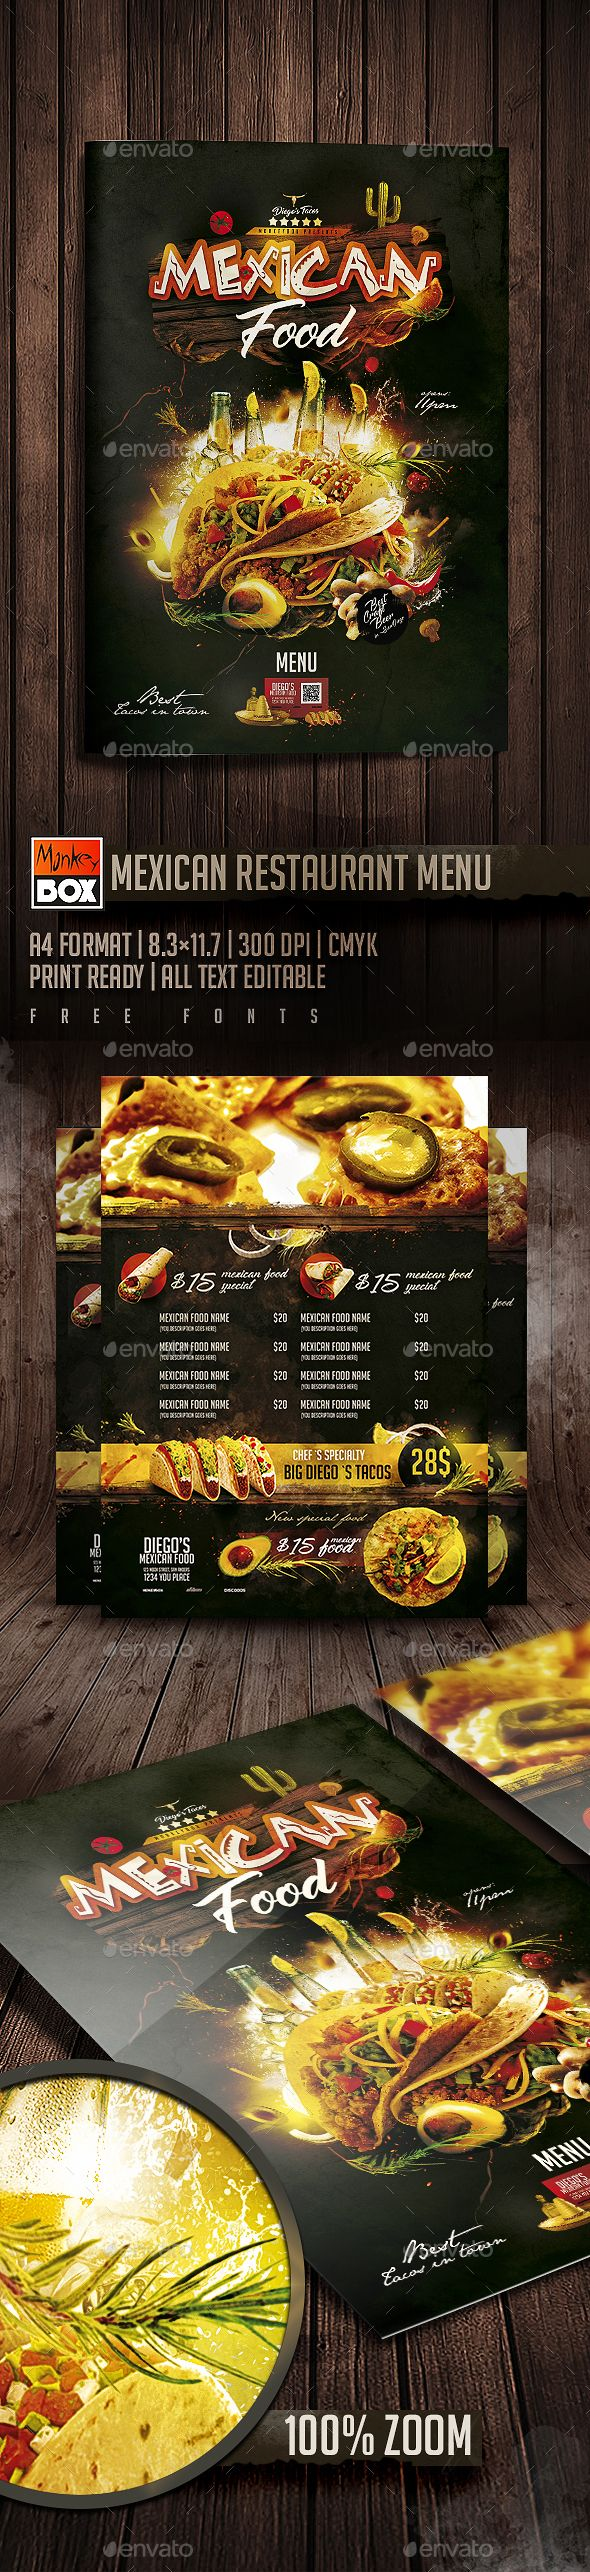 pin by maria alena on food restaurant menu flyre templates